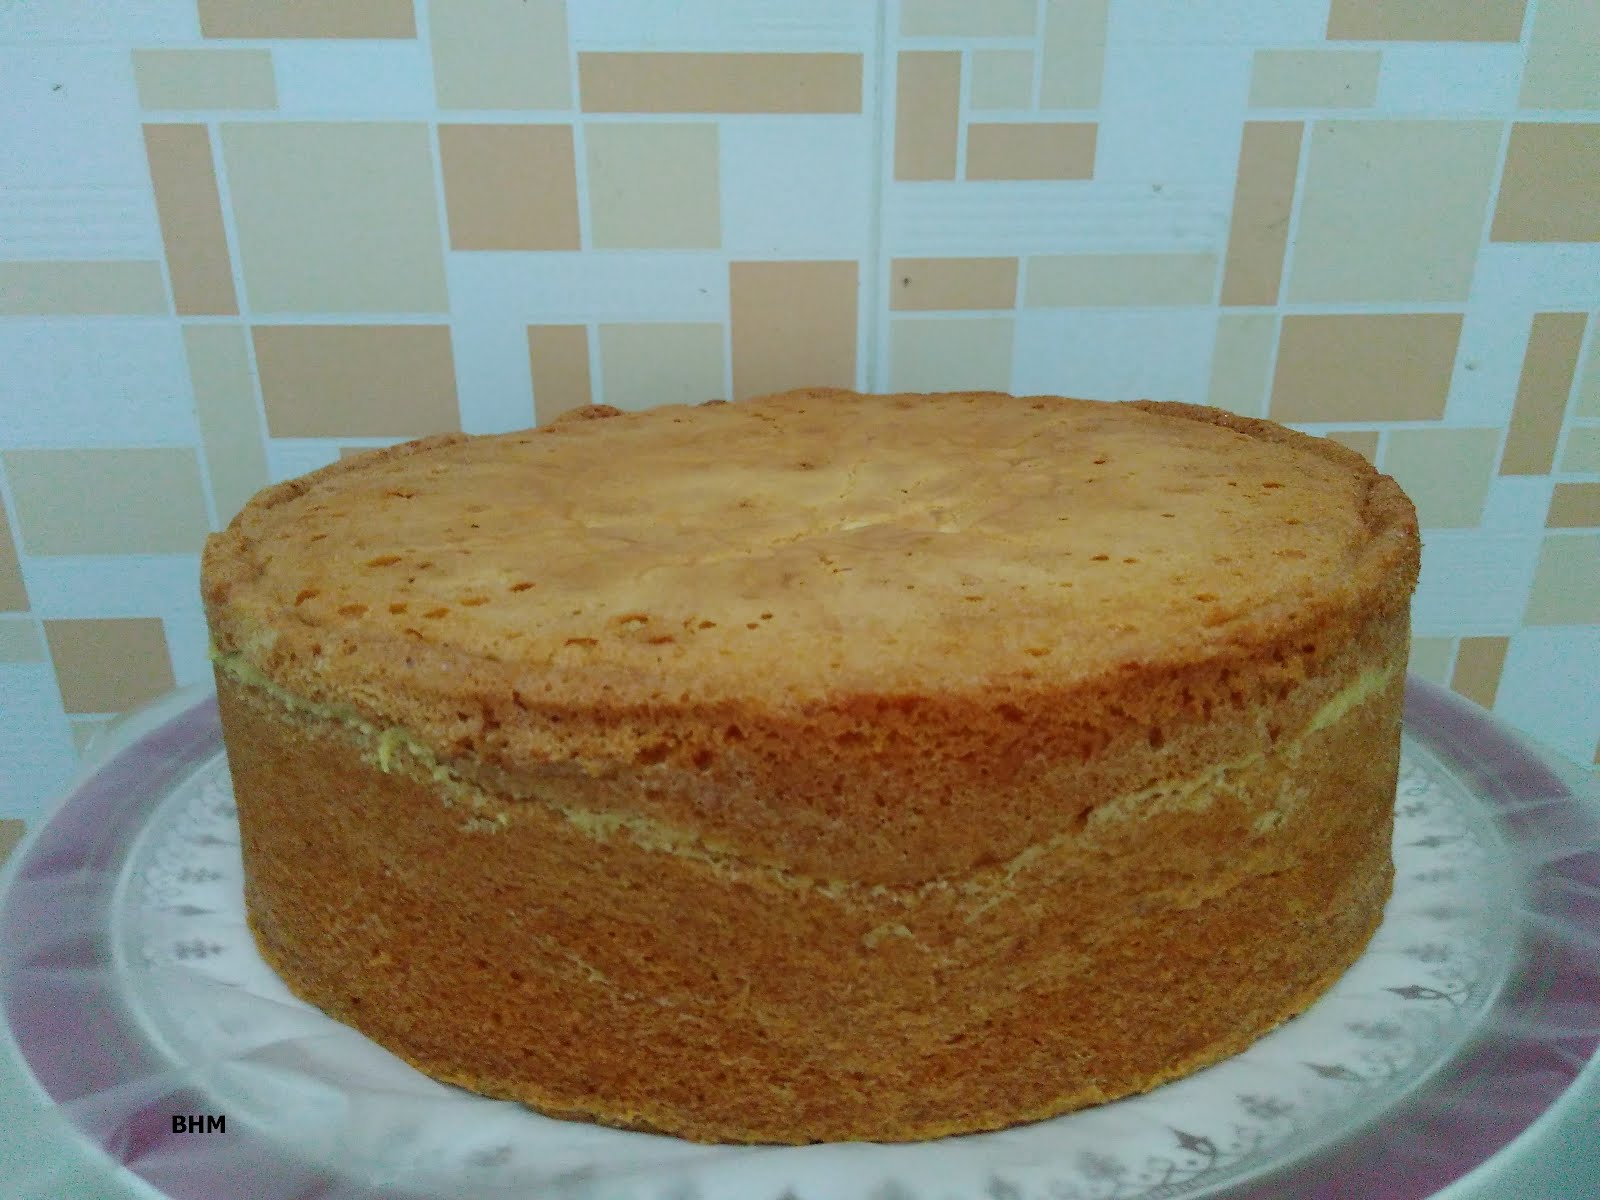 Jual Cake Moka Kue Bolu Moka